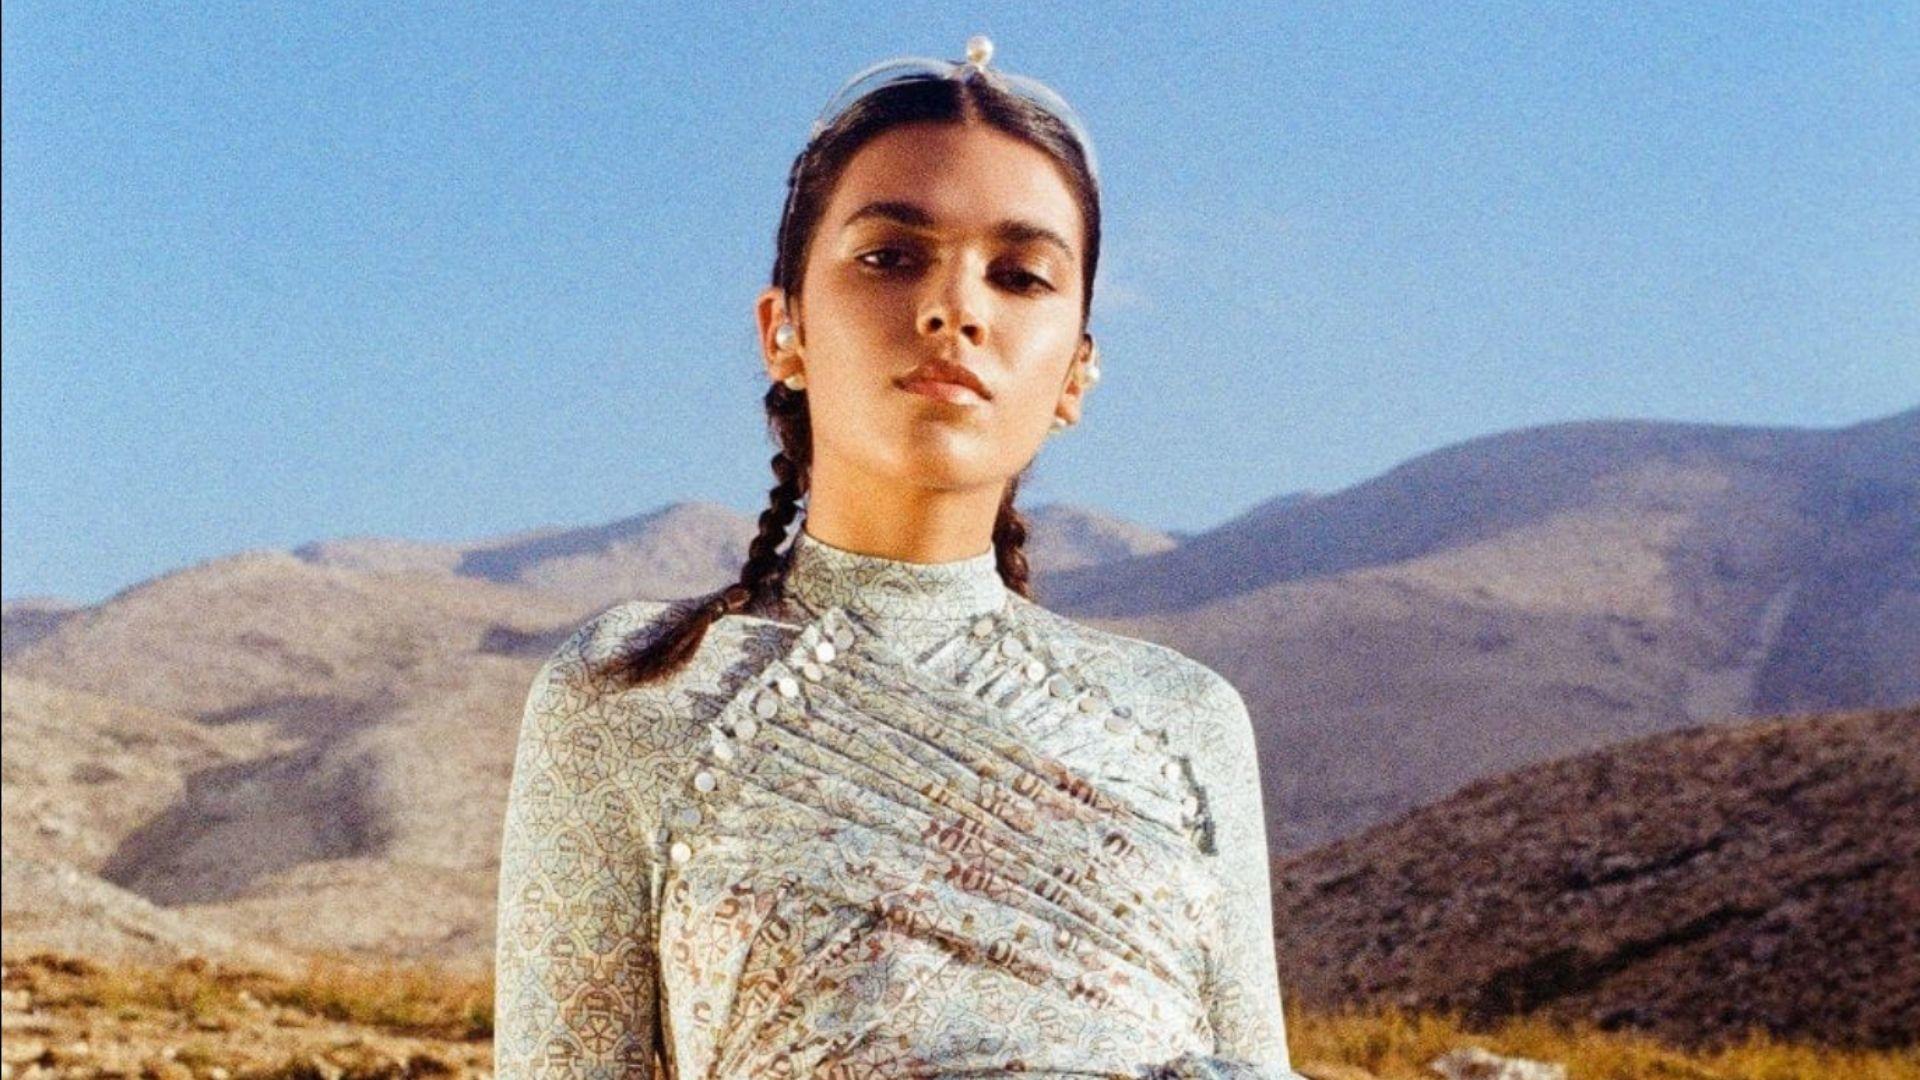 Introducing Niili: The New Dubai-Based Fashion Brand You Should Have On Your Radar